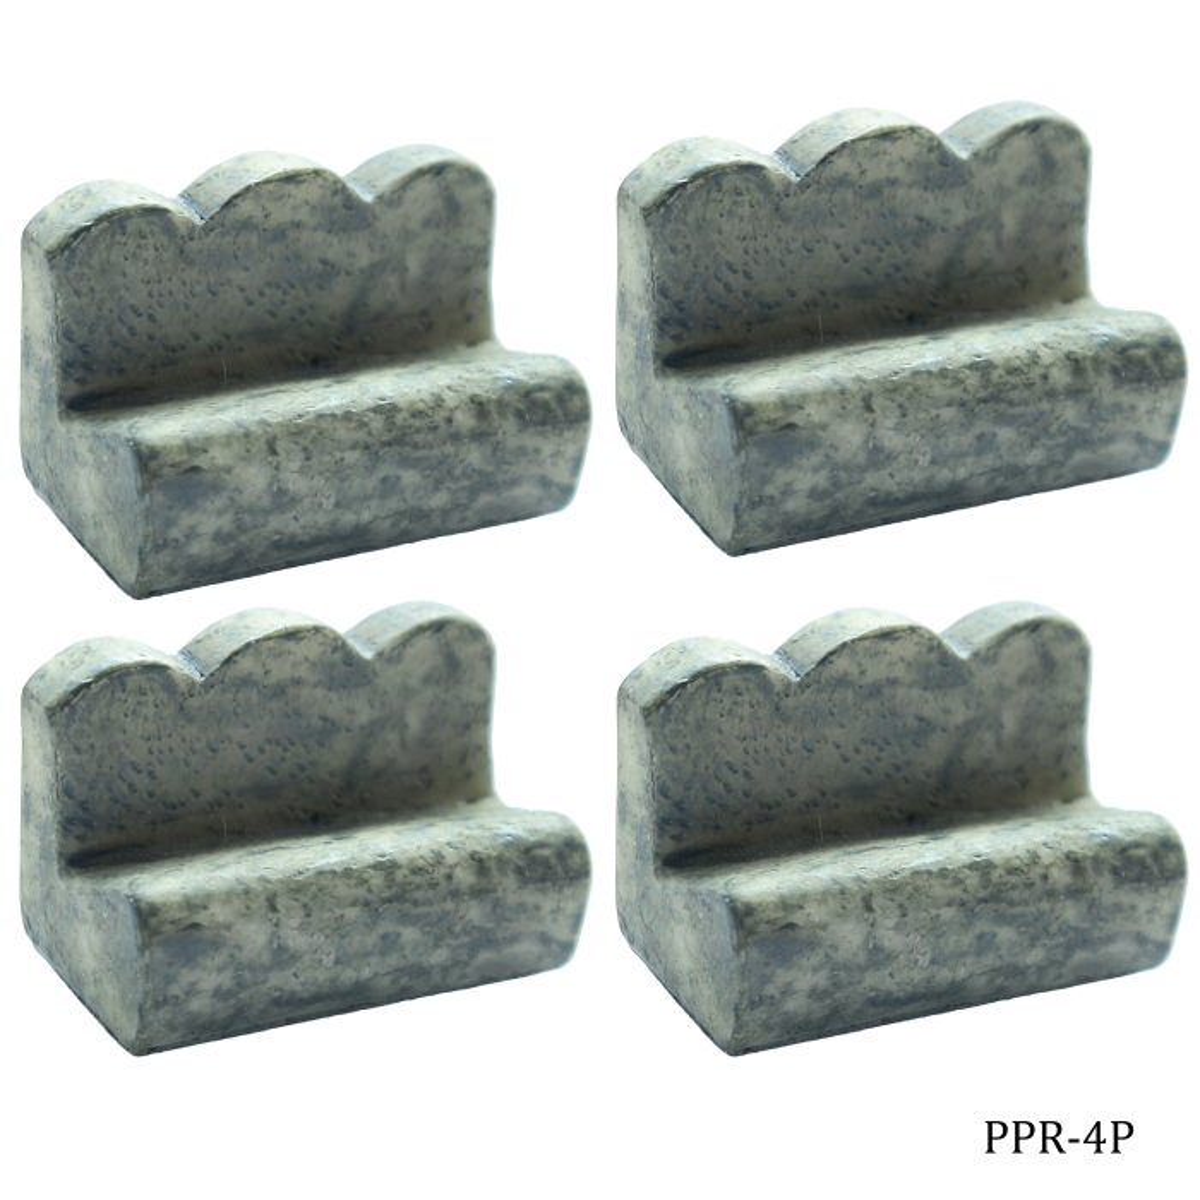 Miniature Platform Bench